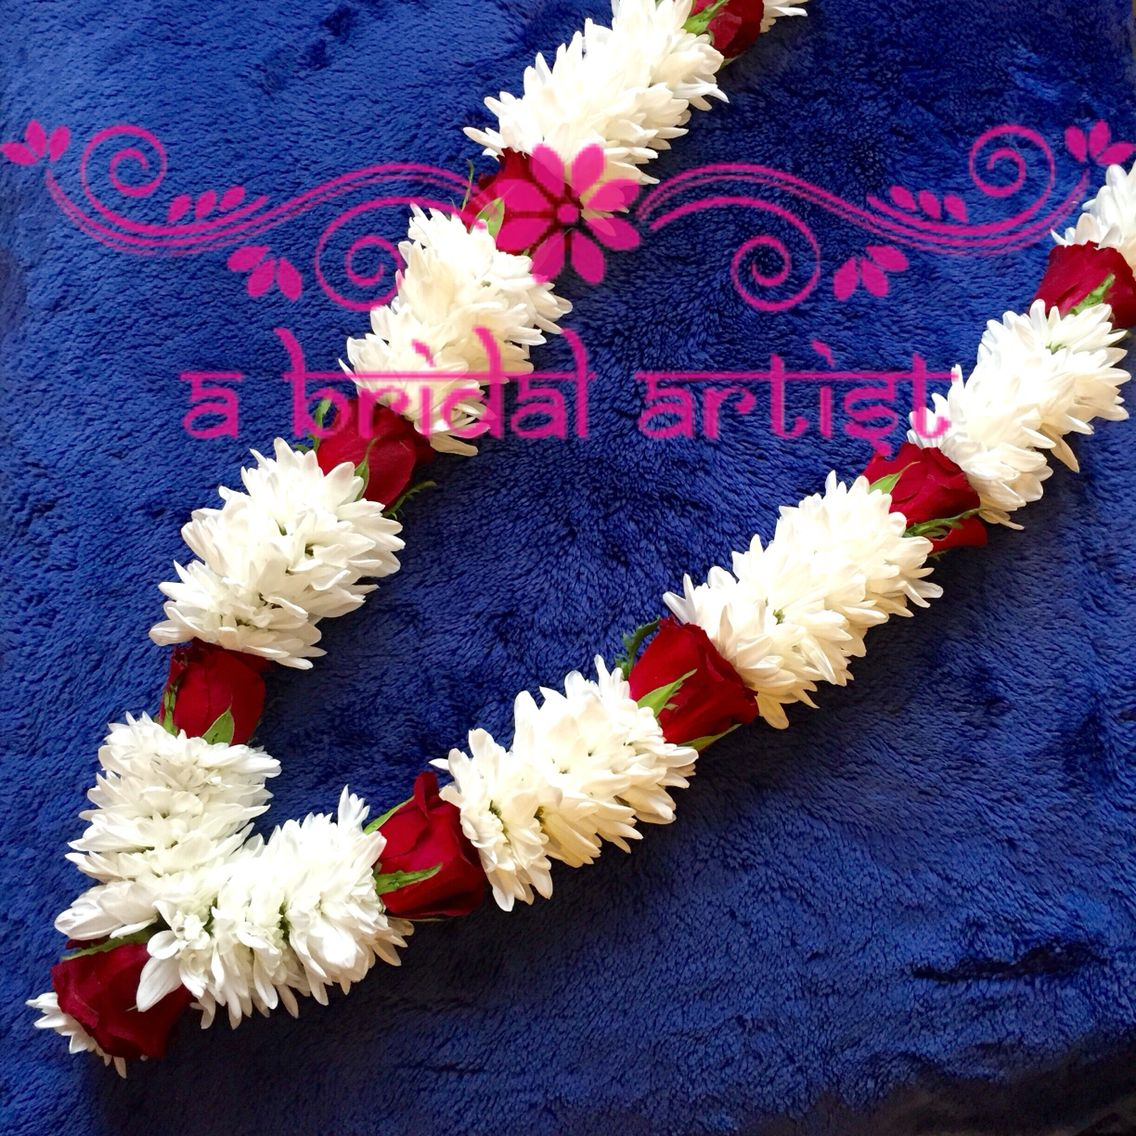 Marvelous Exquisite Designer Wedding Garland (jaimala / Haar / Varmala) Made From Fresh  Flowers.